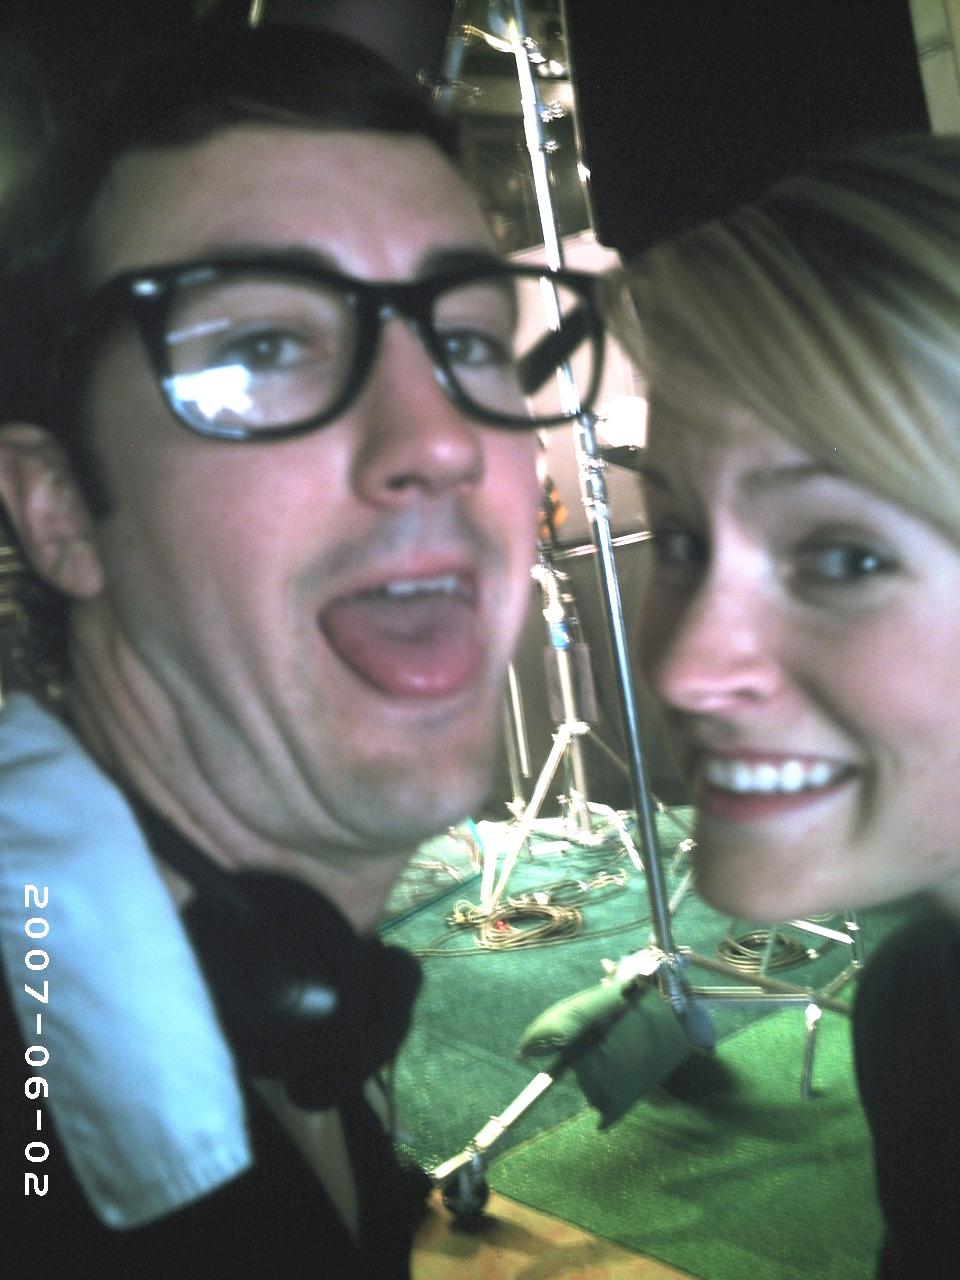 Cornhole: The Movie - Jimmy & Ellie